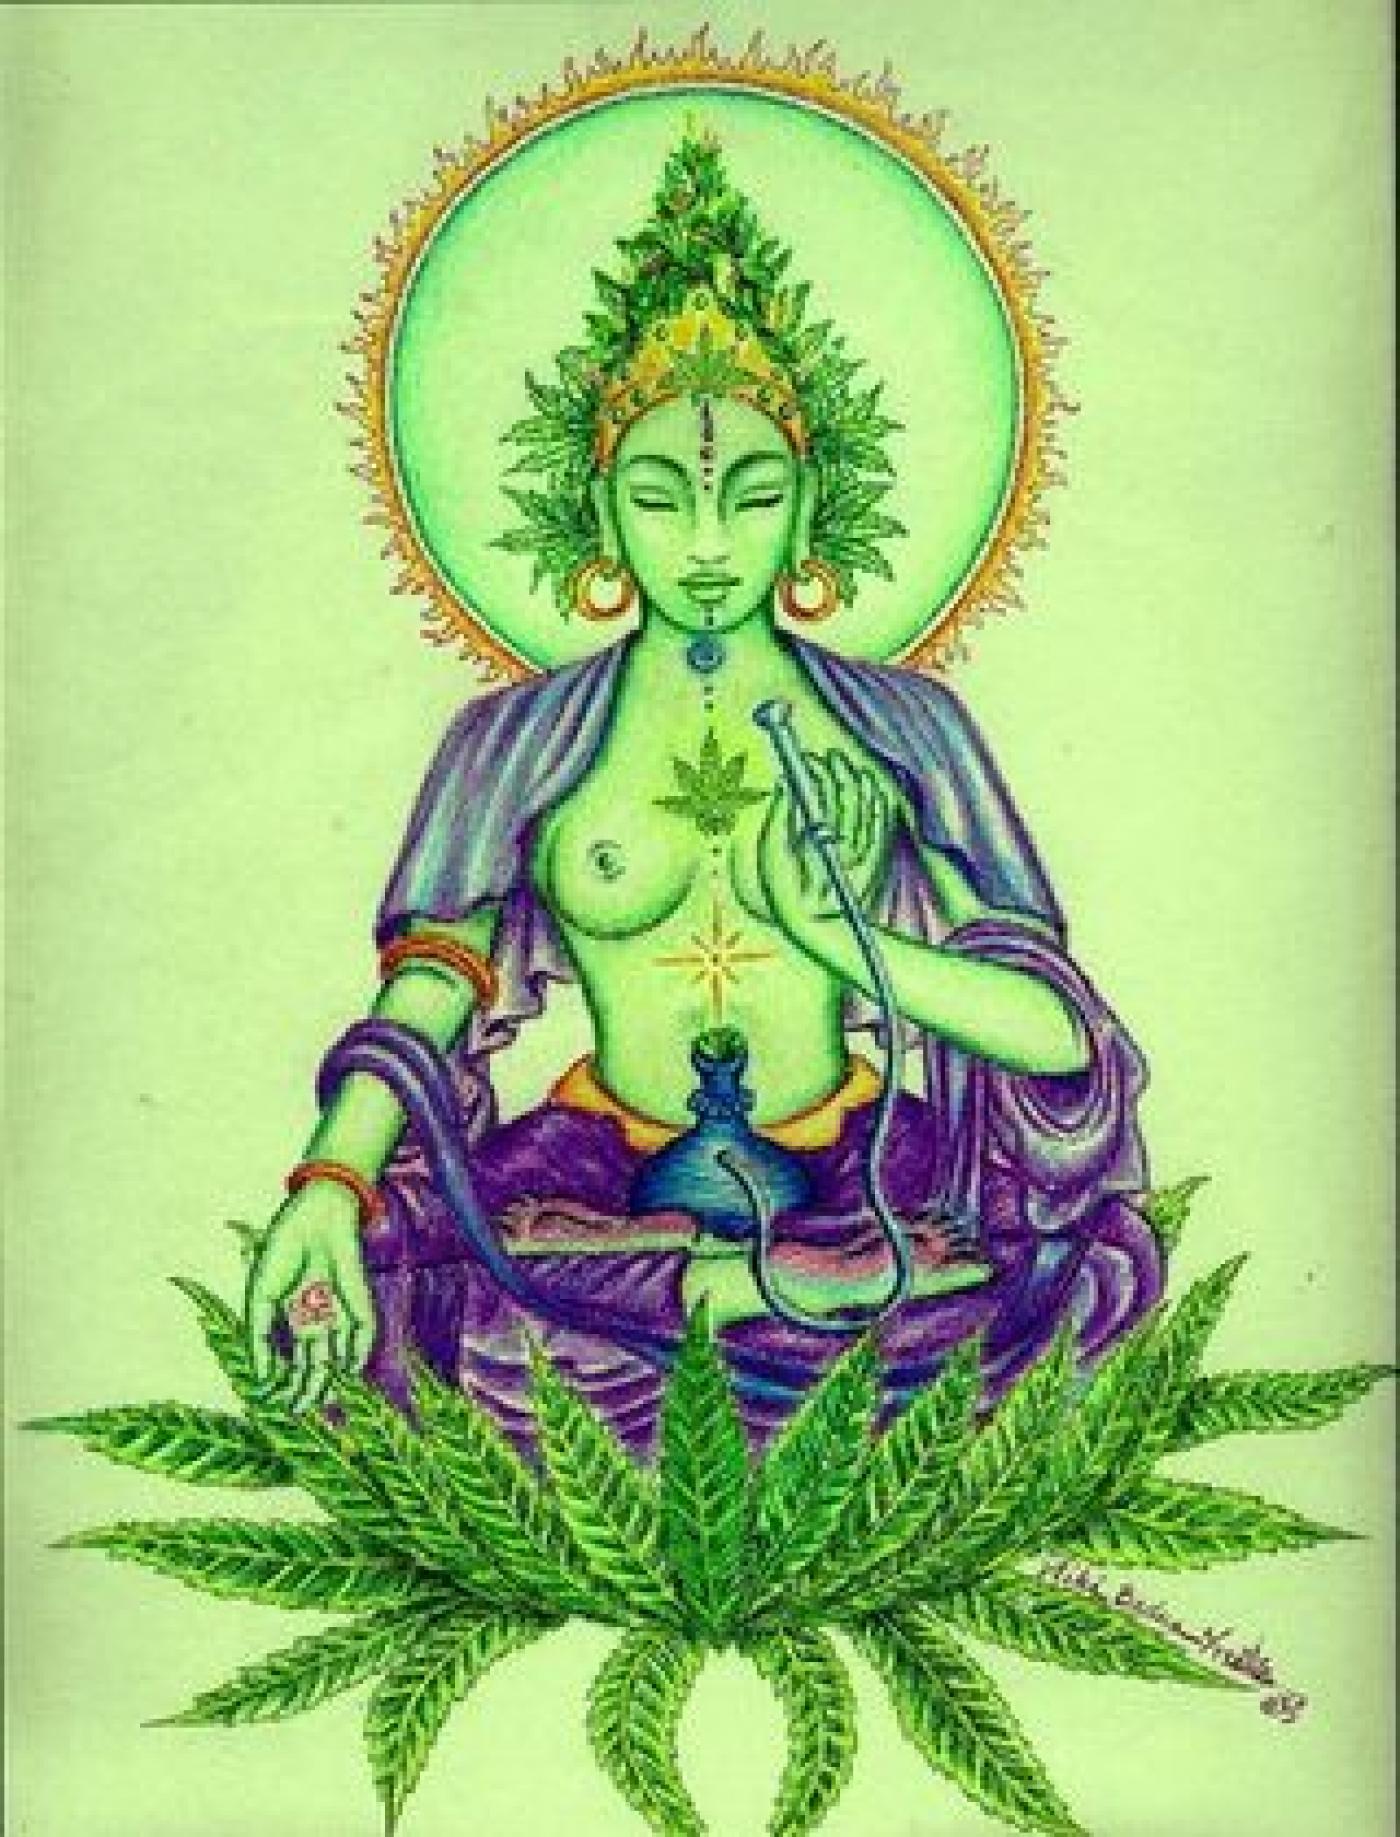 cropped-marijuan.png